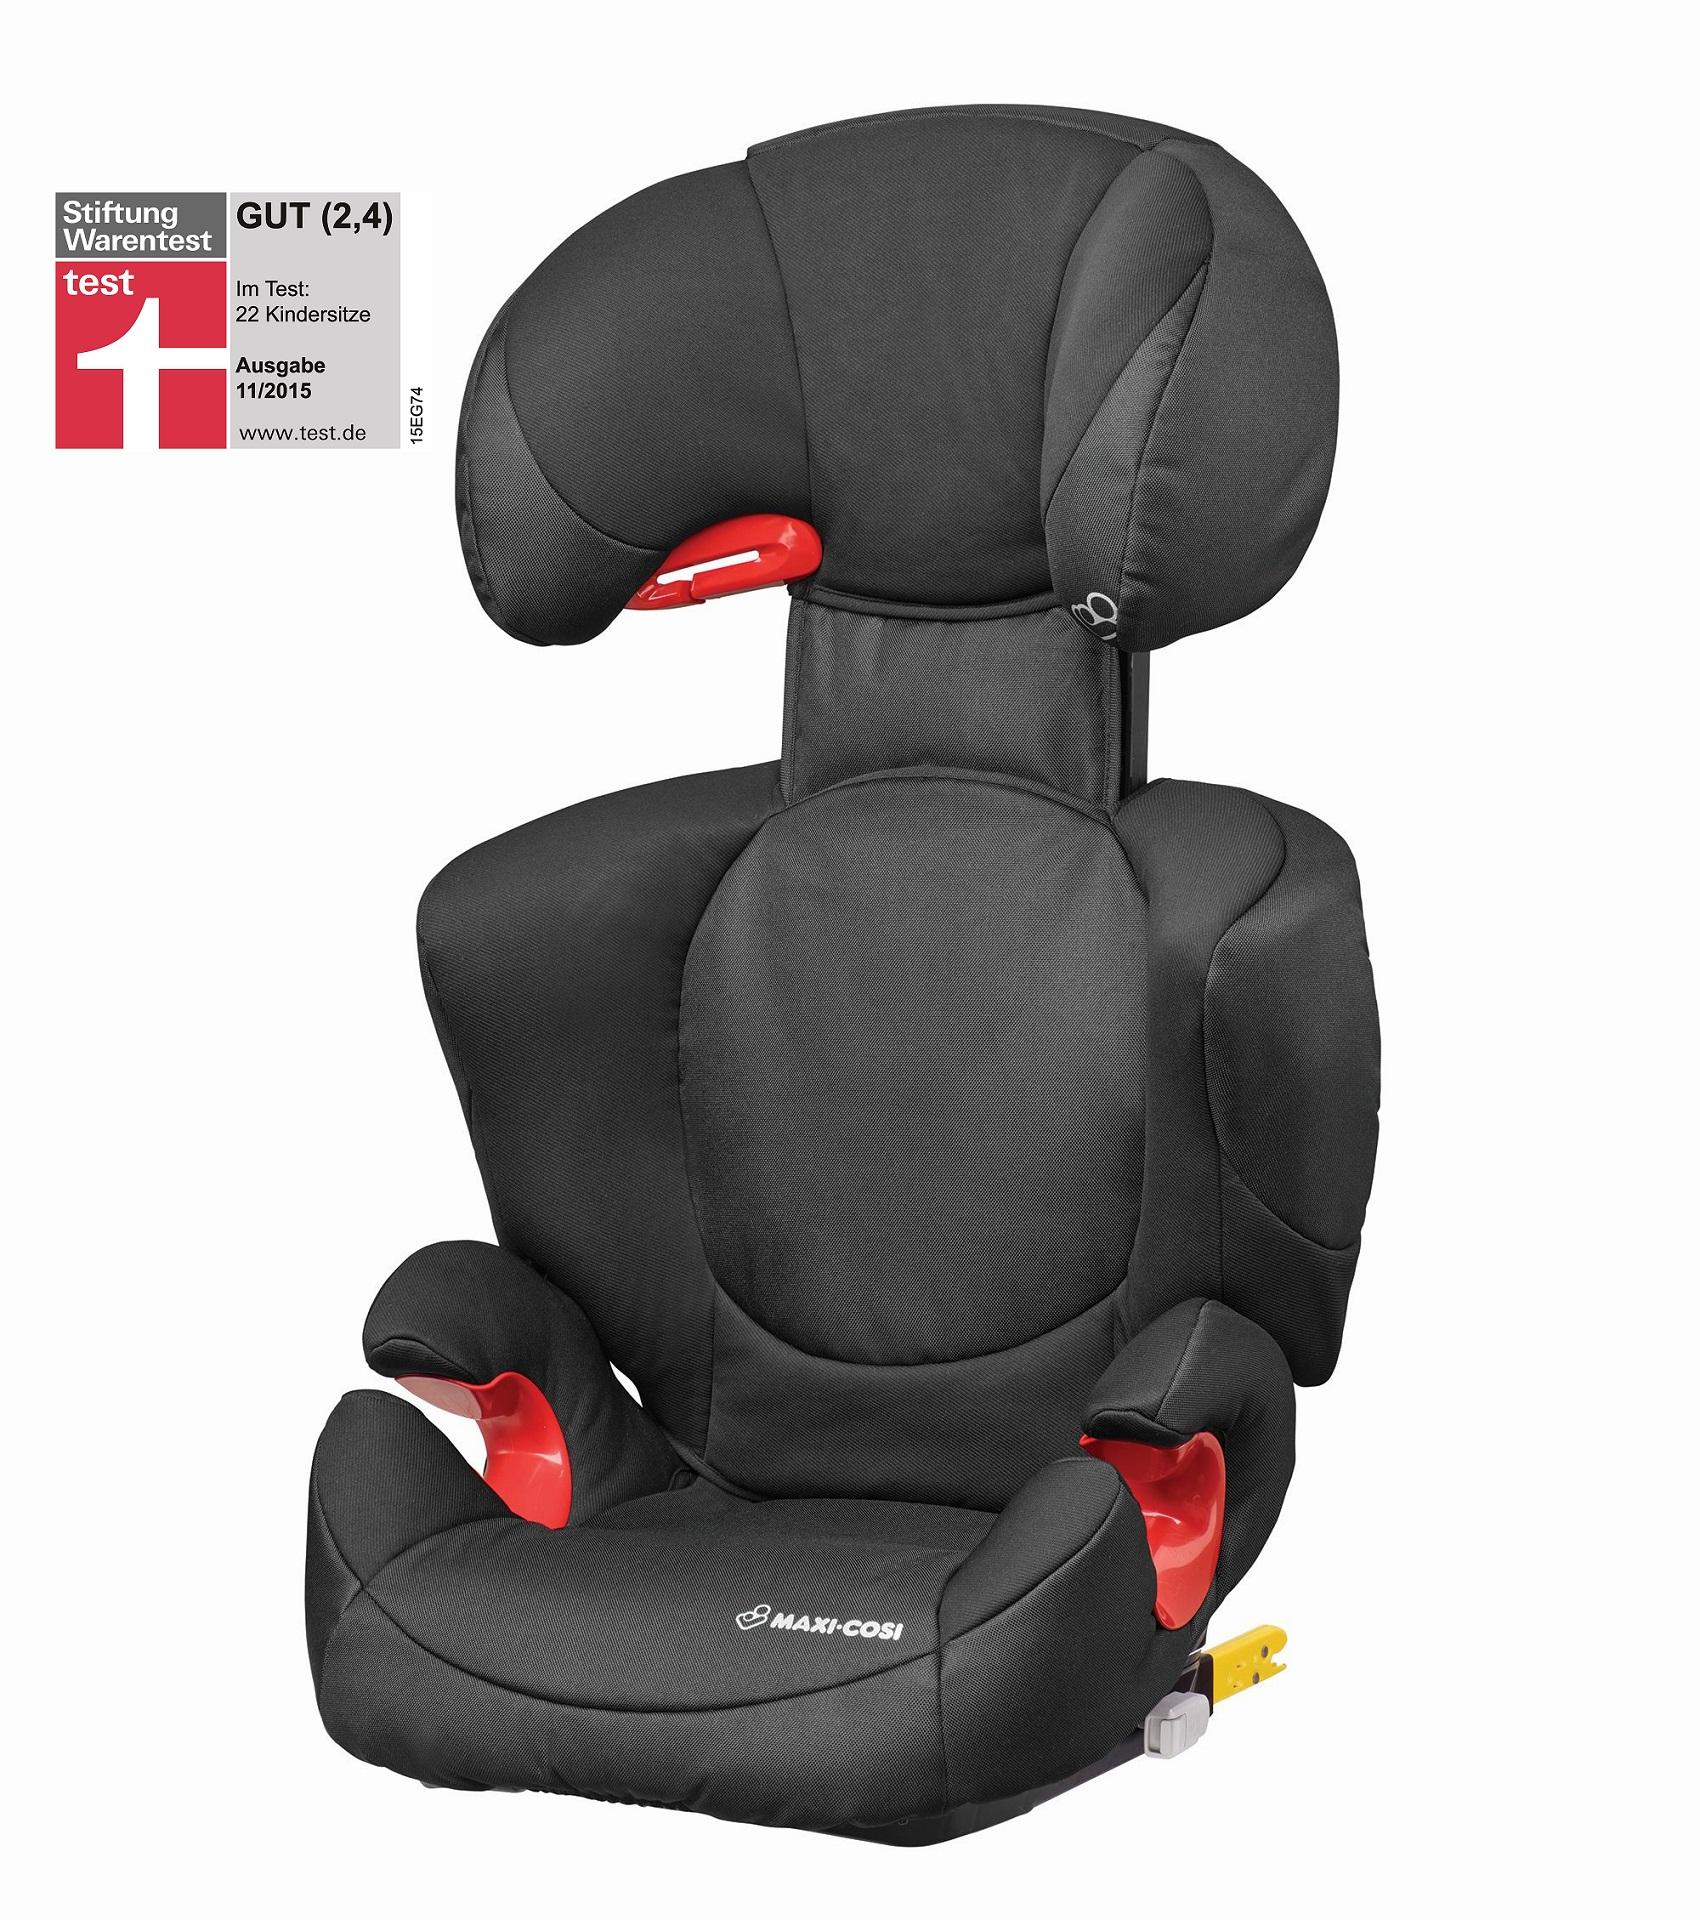 maxi cosi child car seat rodi xp fix buy at kidsroom. Black Bedroom Furniture Sets. Home Design Ideas